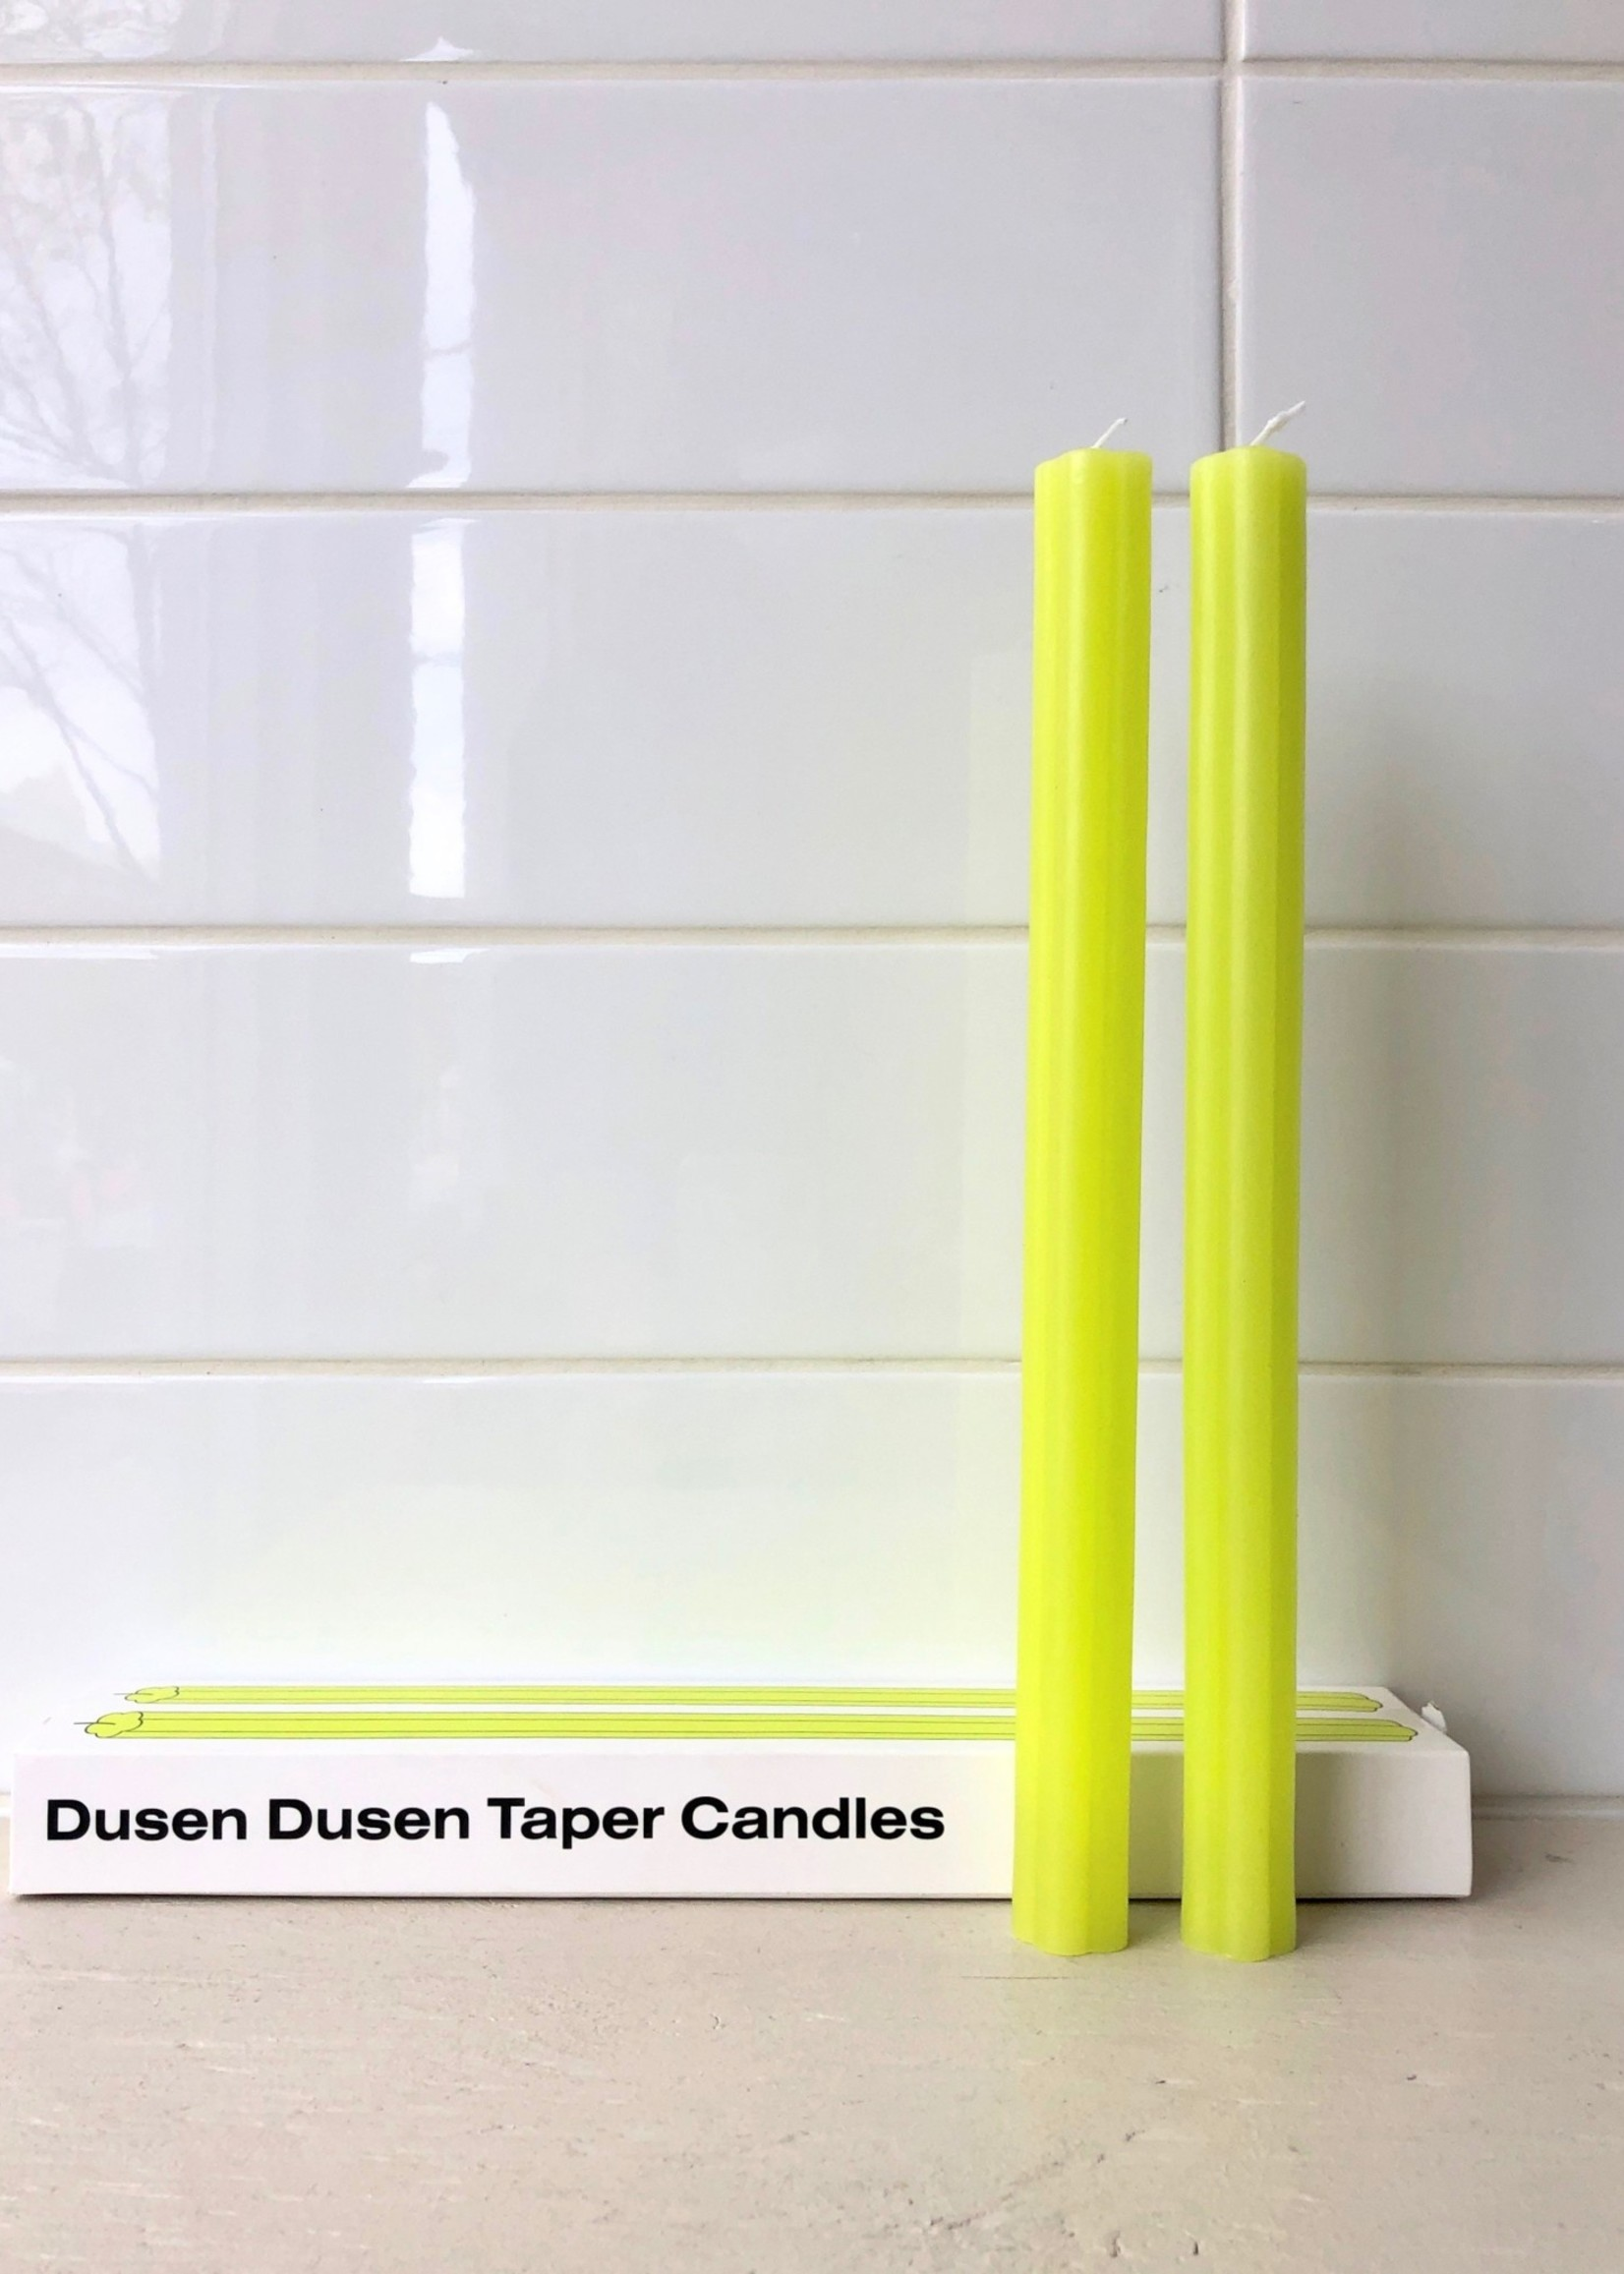 Areaware Dusen Dusen pair of candles